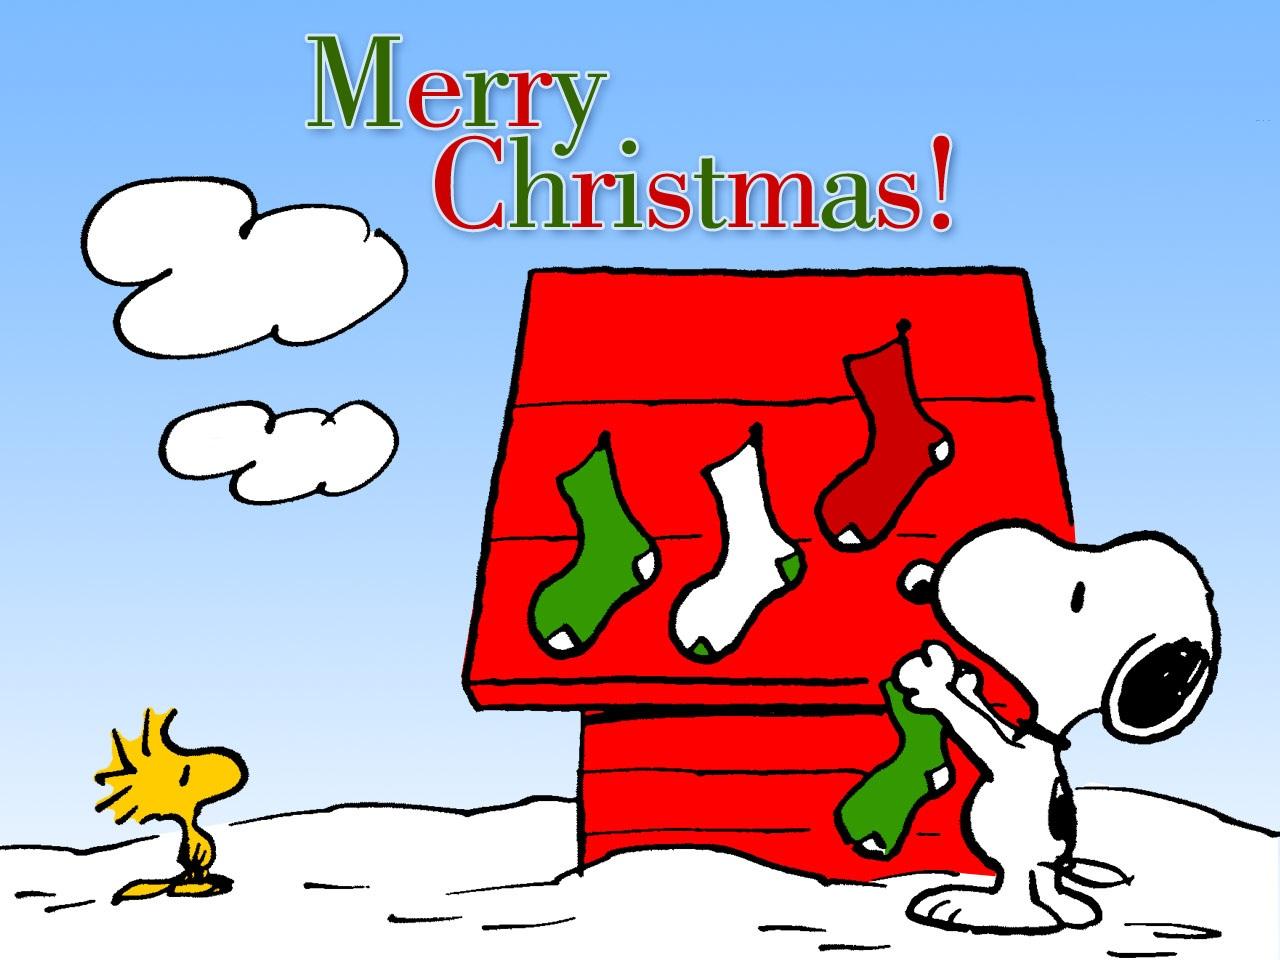 snoopy christmas wallpapers snoopy christmas wallpapers 1280x960 - Snoopys Christmas Lyrics